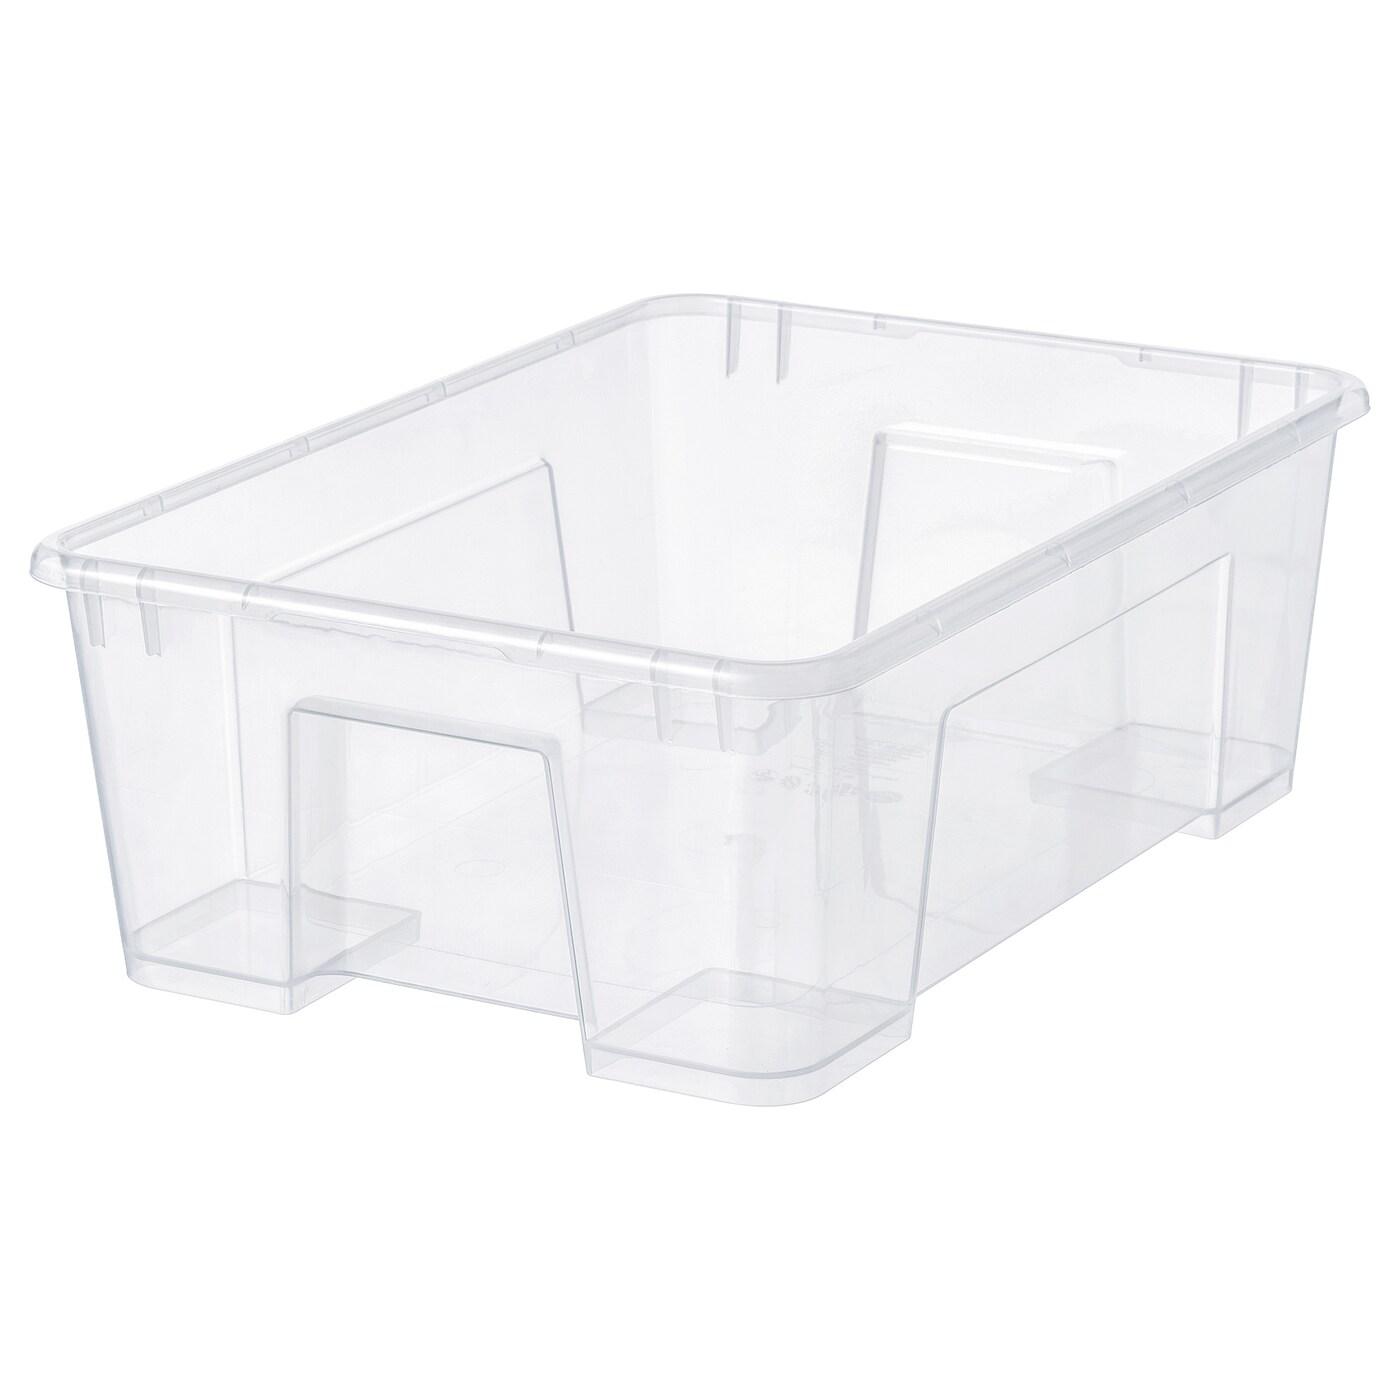 ИКЕА SAMLA, Коробка, 401.029.78, прозрачный, 39x28x14 см / 11 л